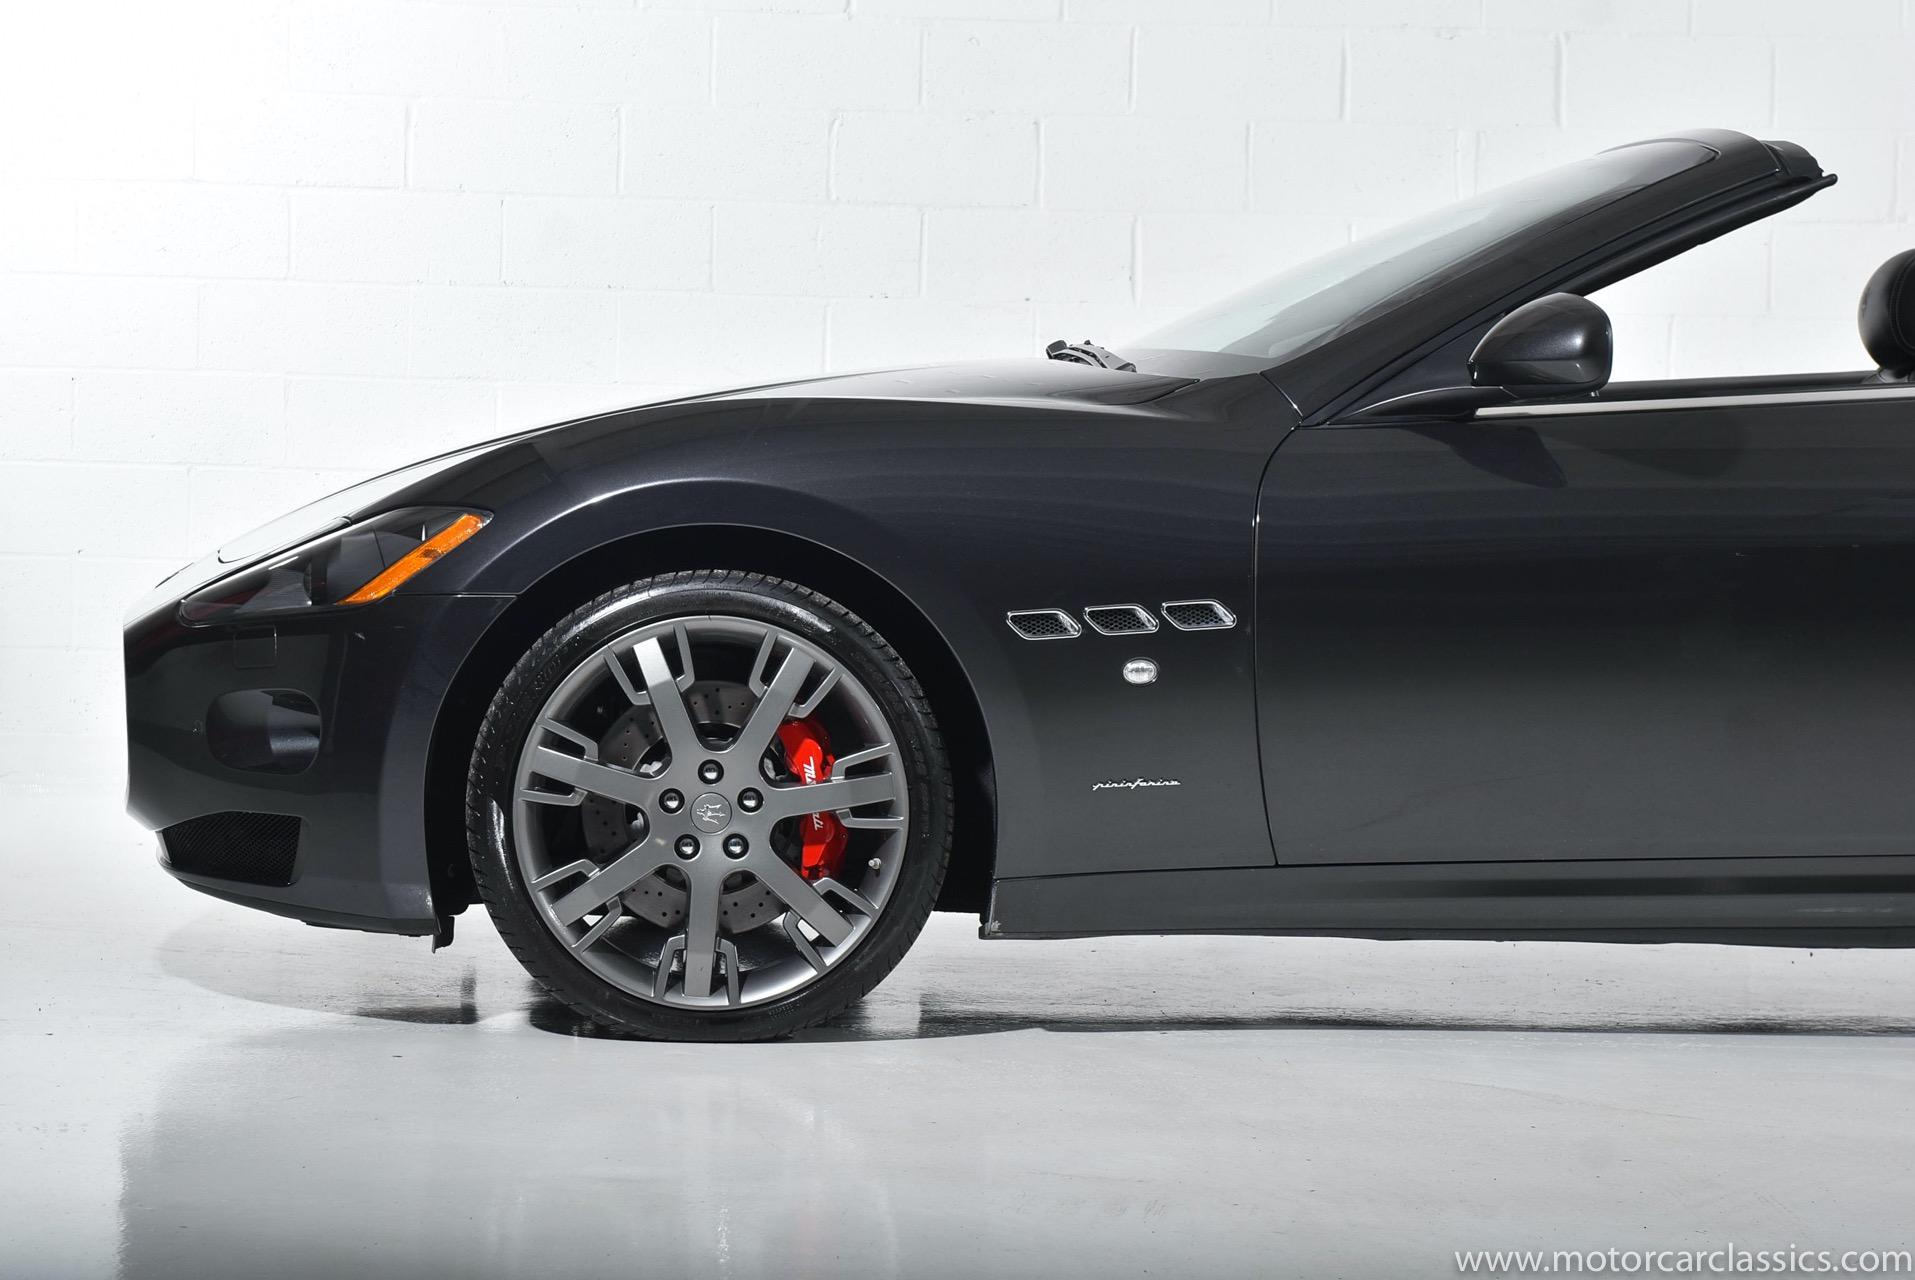 2011 Maserati GranTurismo S